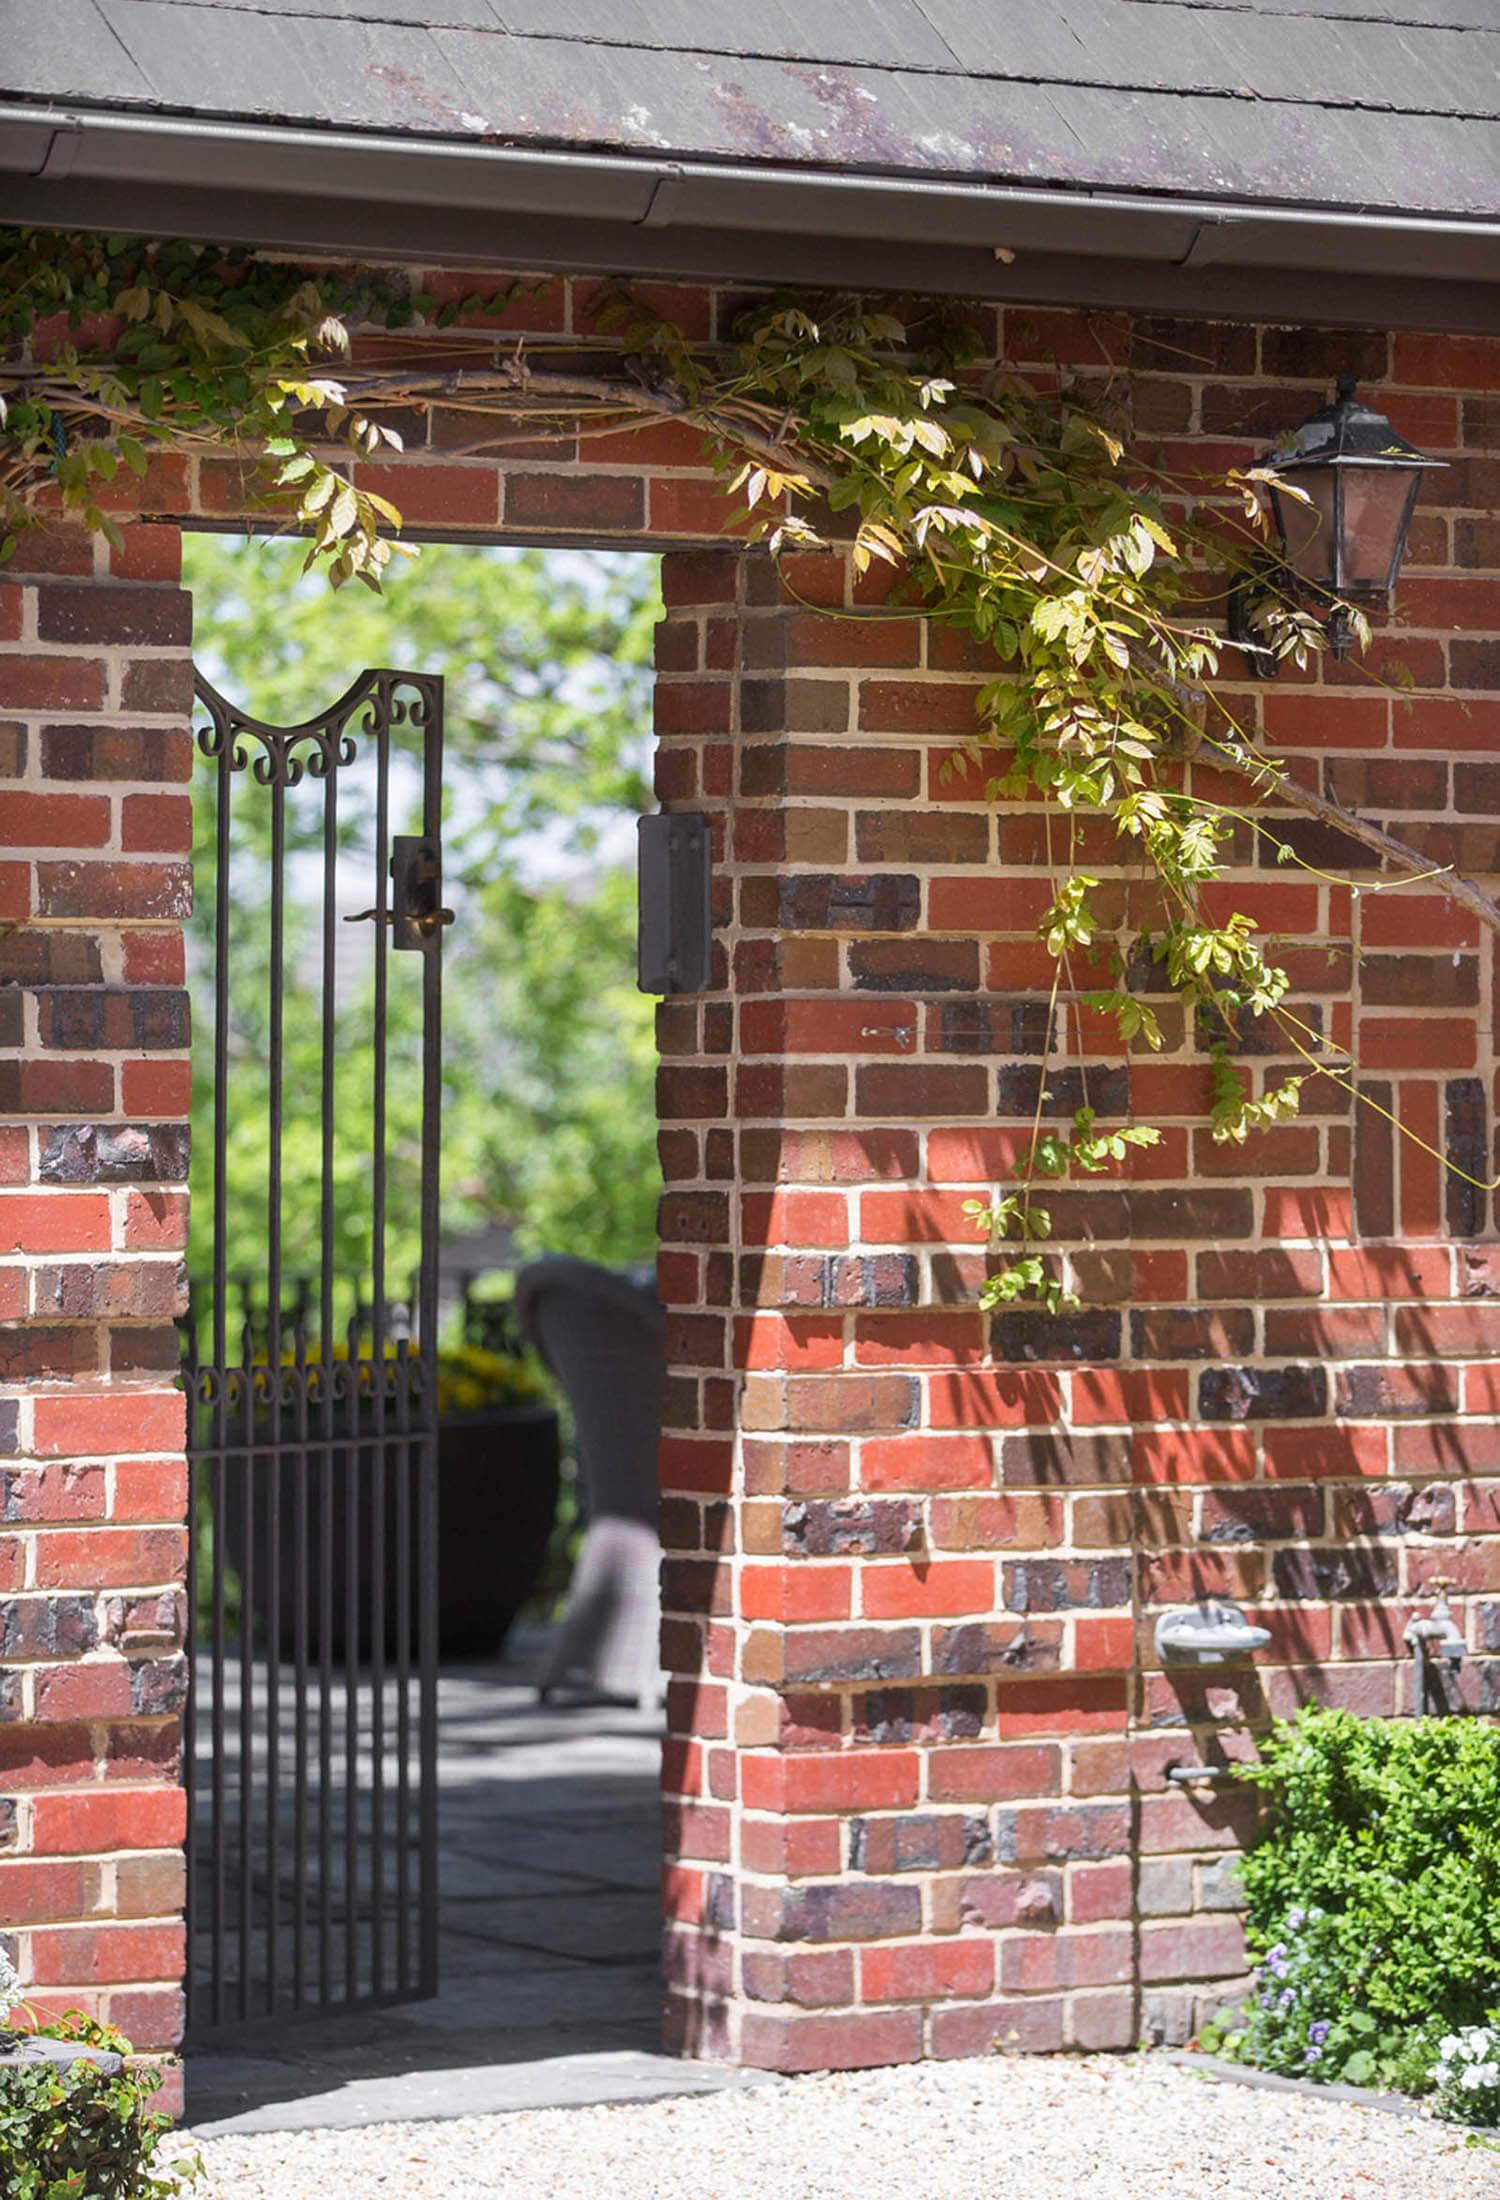 est living open house jellis craig 349 Union Road Balwyn 22